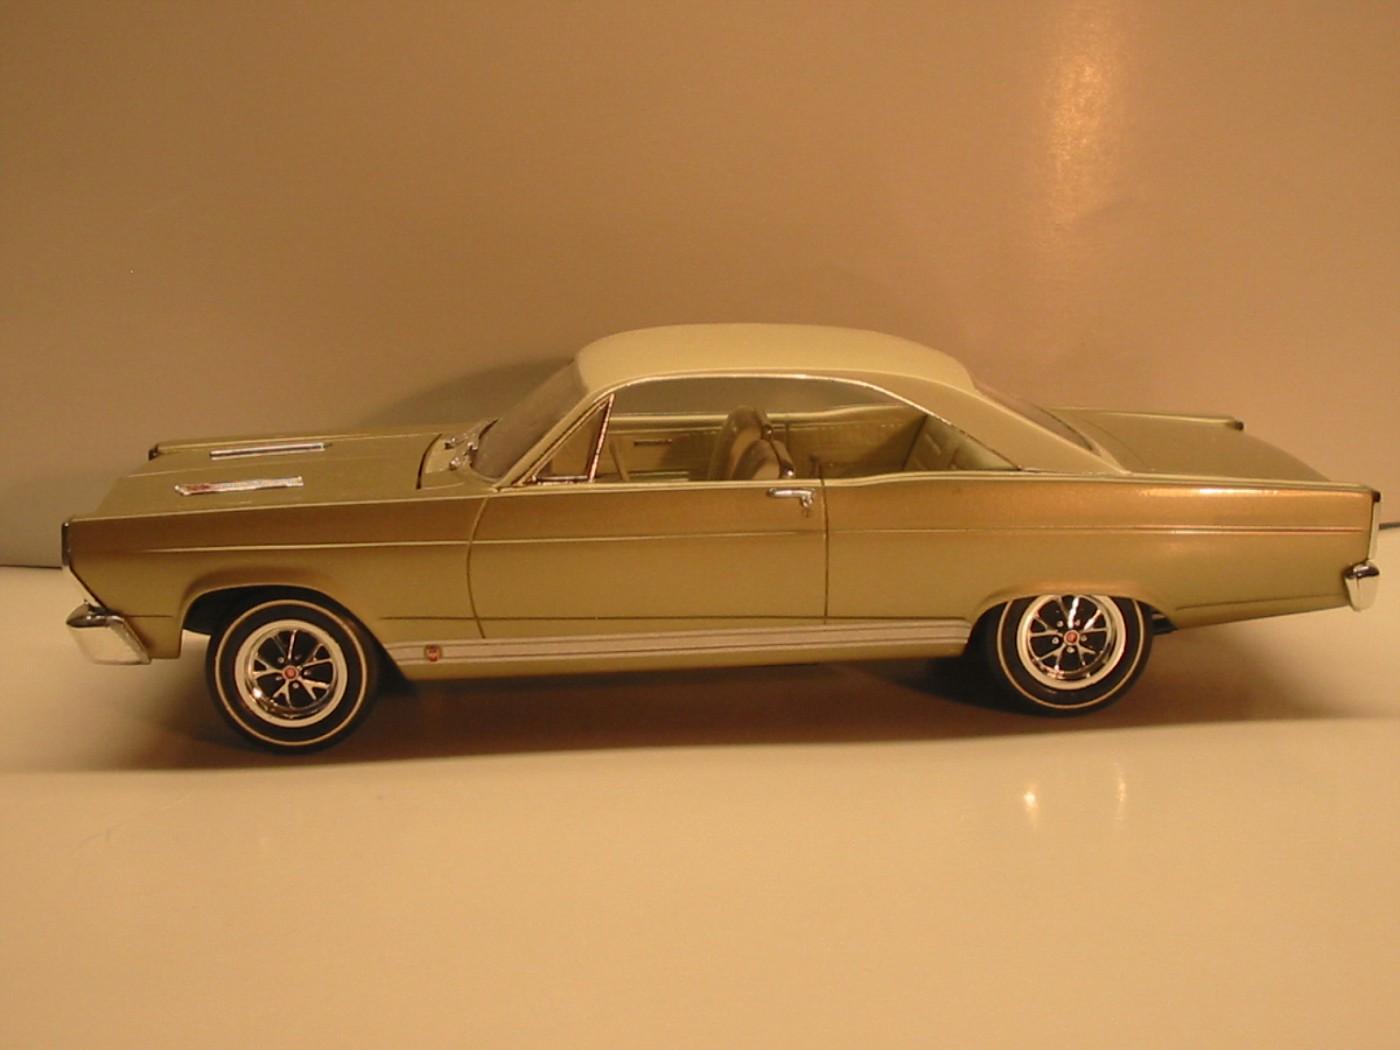 1966 Ford Fairlane GT IMG_0001-vi